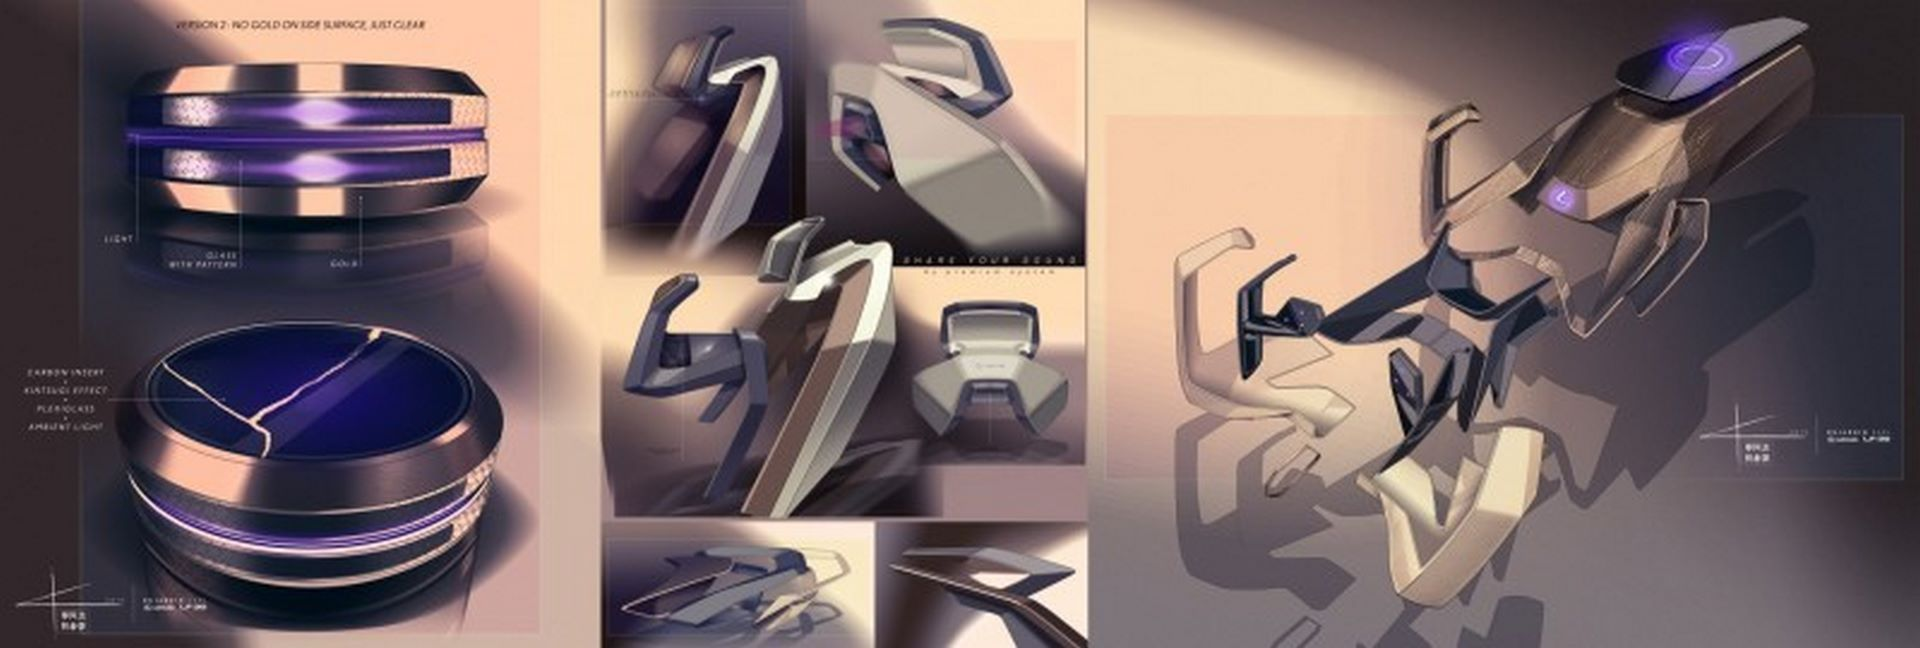 Lexus-LF-30-Concept-62